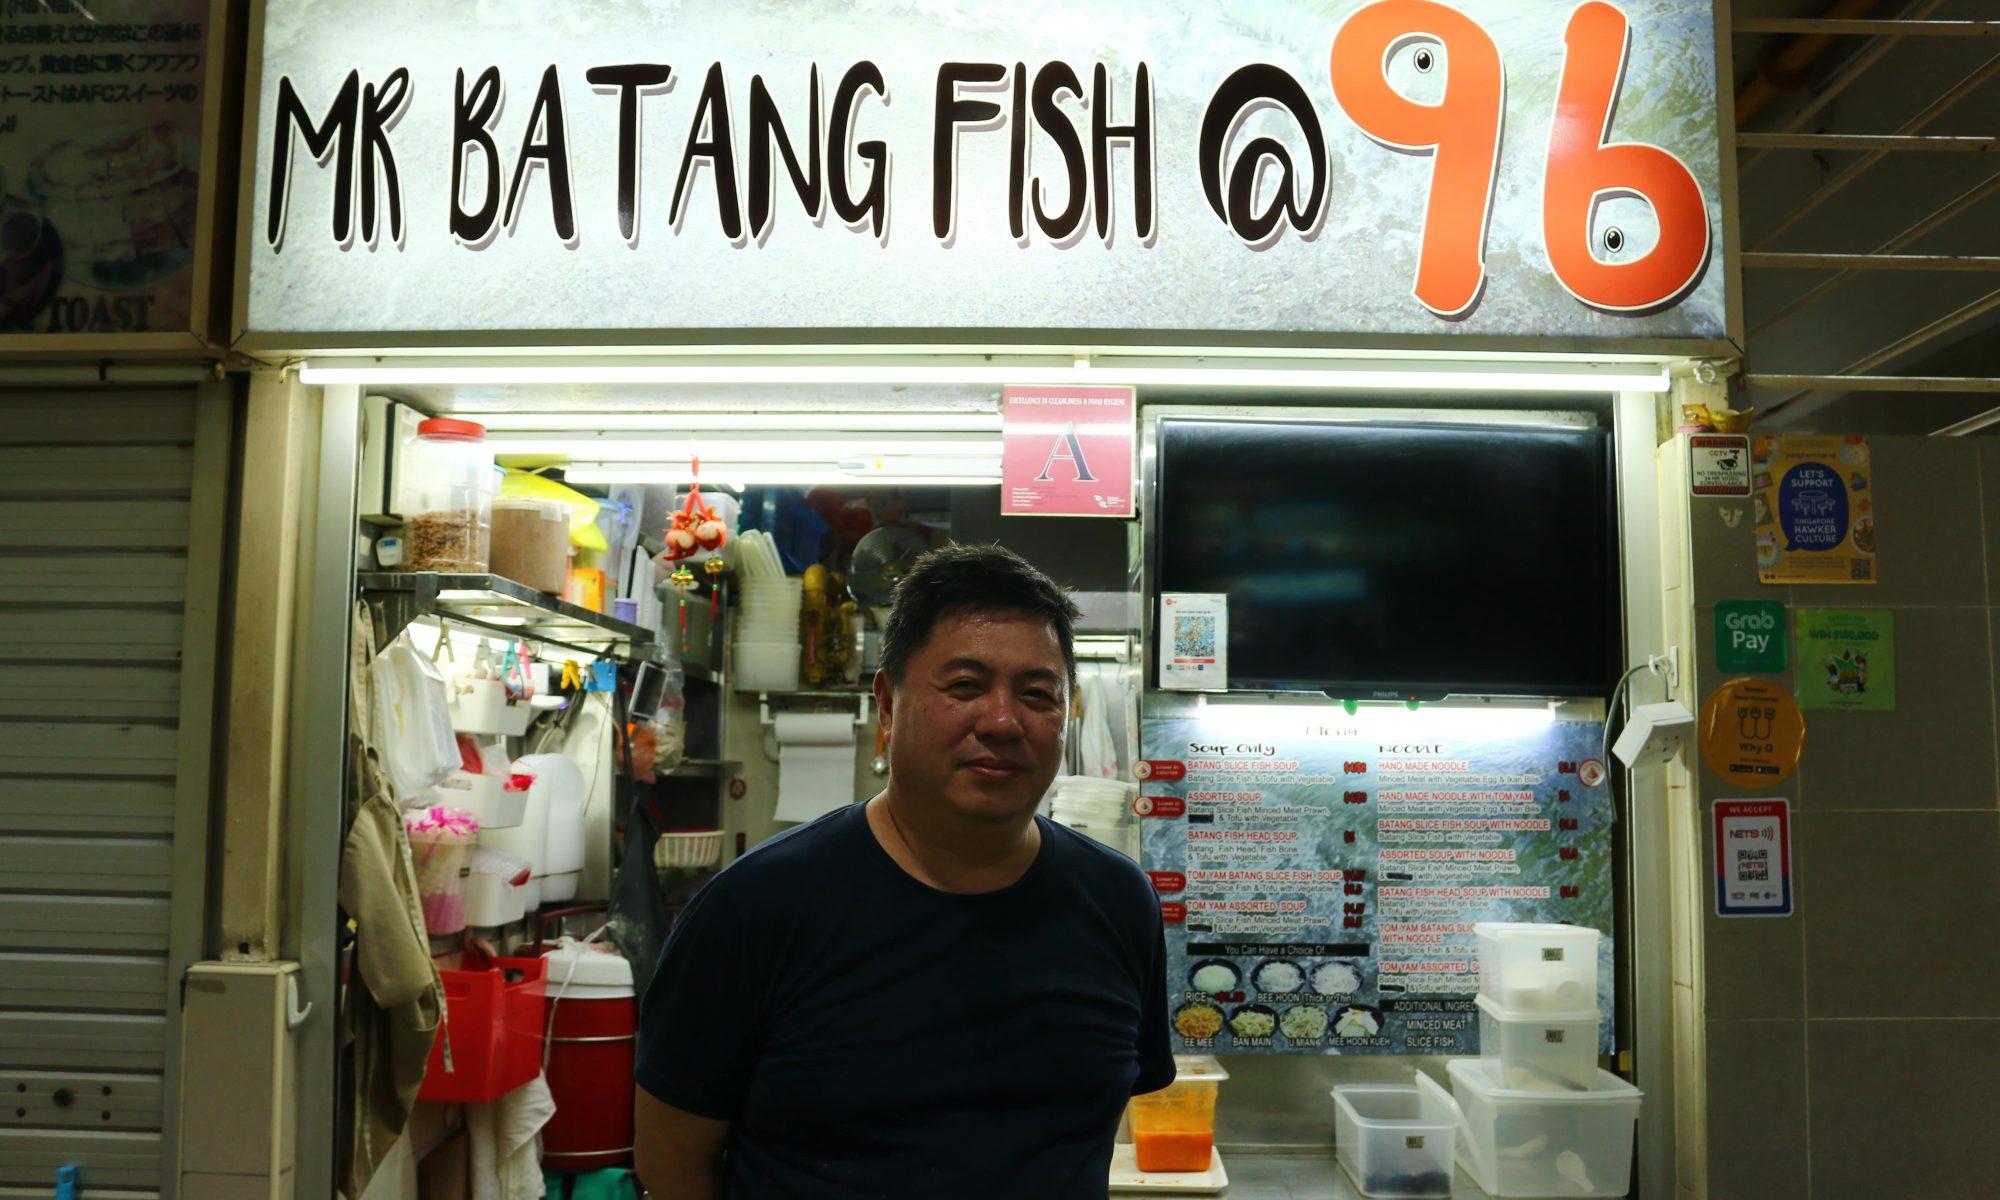 MR BATANG FISH @96